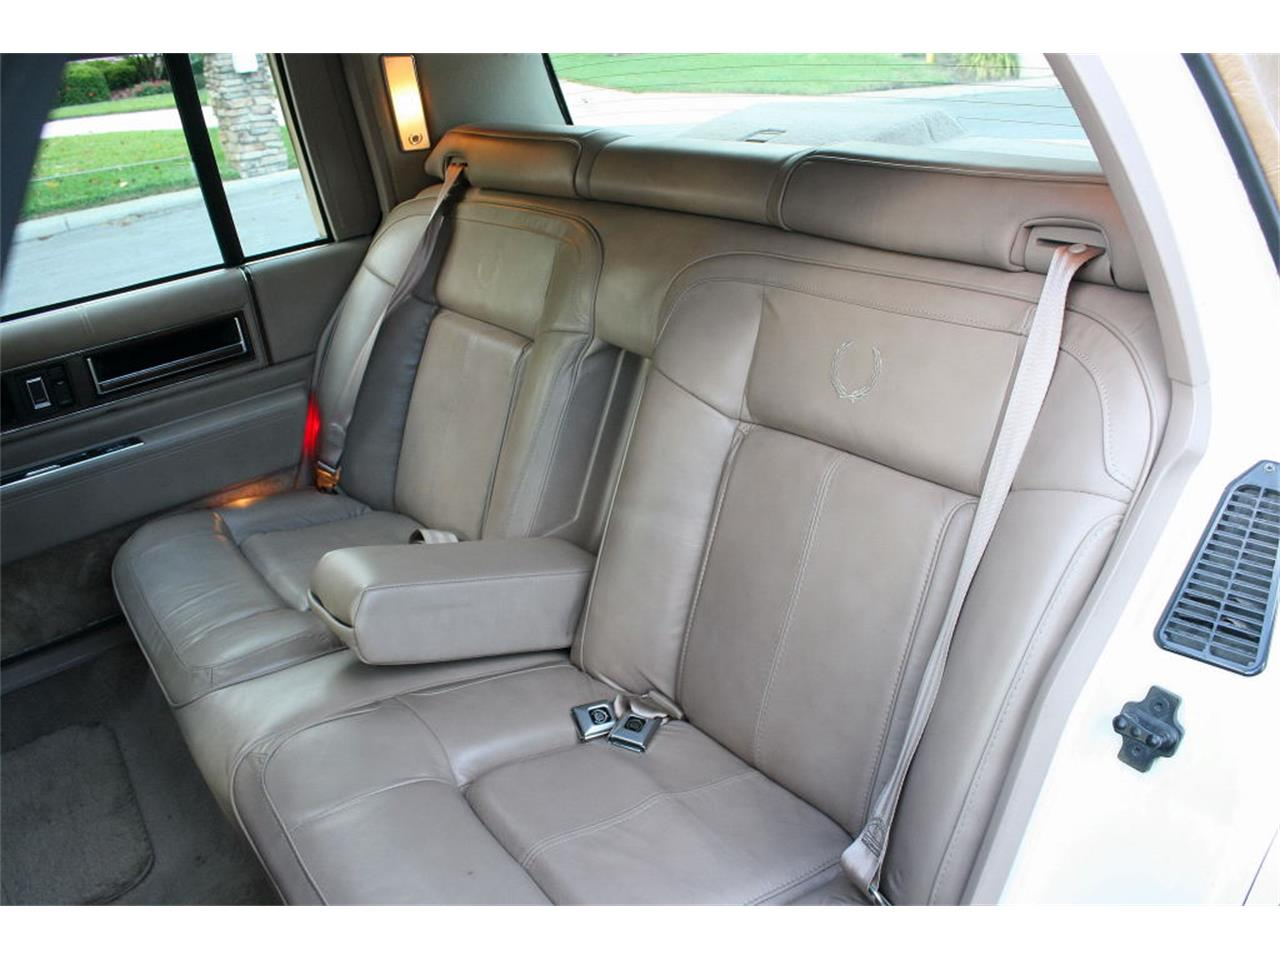 Large Picture of 1991 Cadillac Sedan located in Lakeland Florida - L5XM